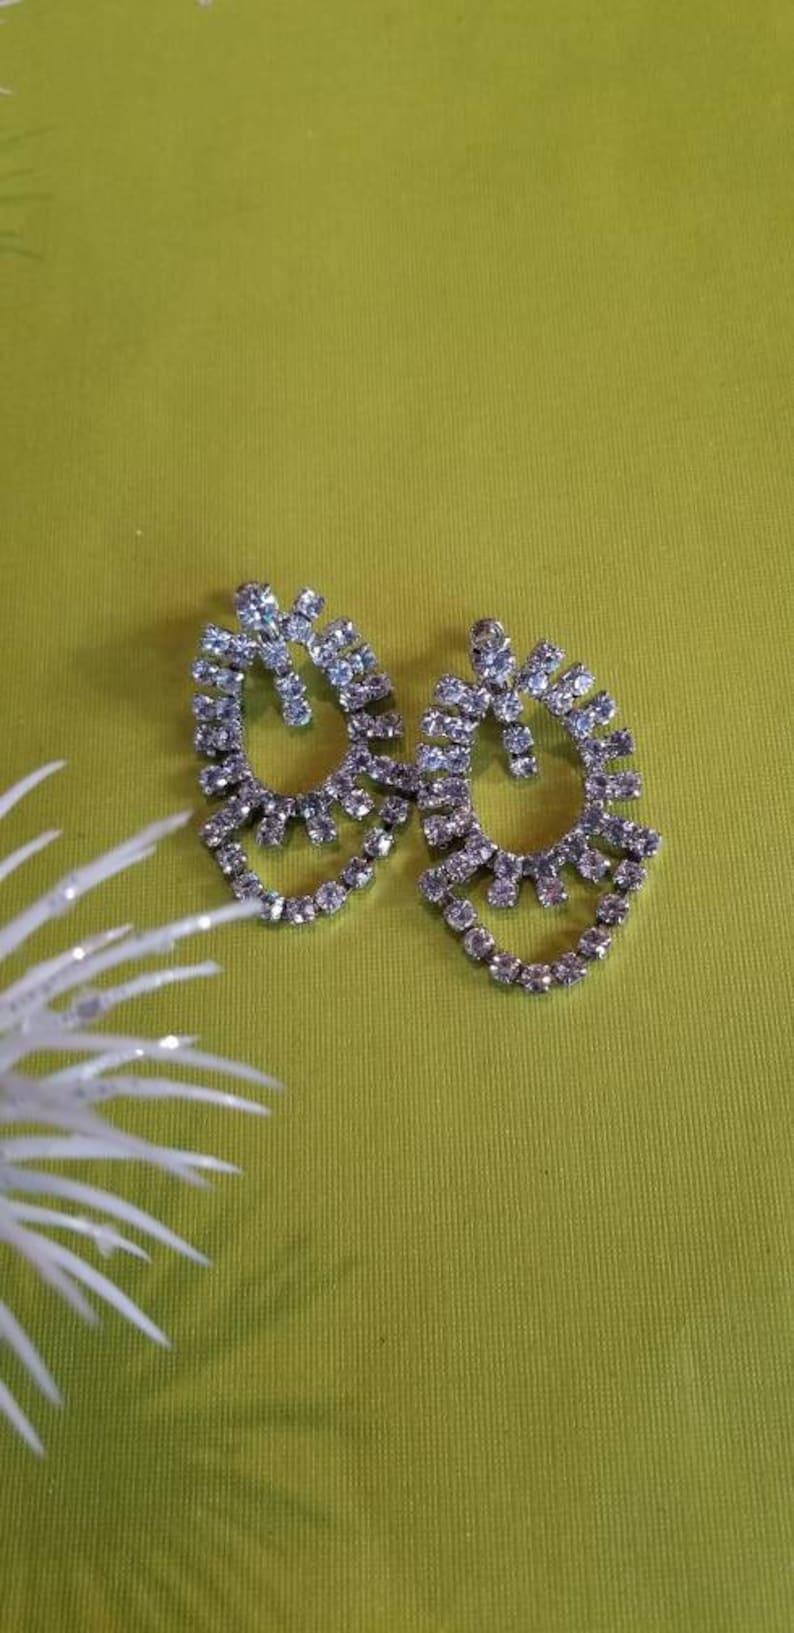 Rhinestone Runway Rhinestone Earrings Silver Clip On Formal Rhinestone Dangle Earrings Exquisite Bold Statement Clip On Earrings